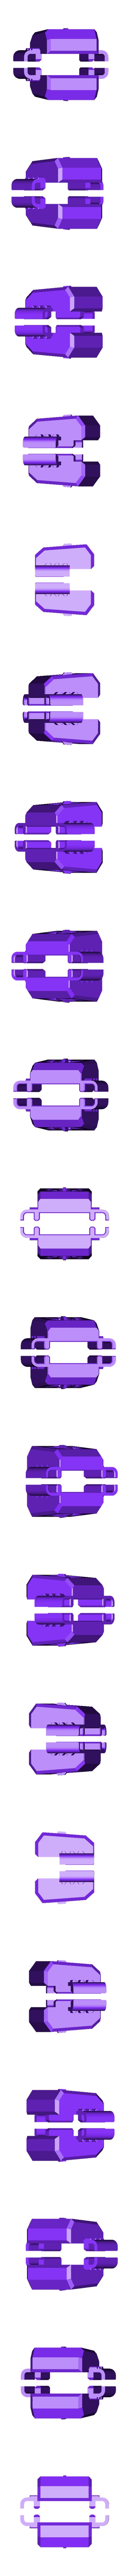 60_Drag_Leg10_KneeFront1_GREEN.stl Download STL file ARTICULATED DRAGONLORD (not Dragonzord) - NO SUPPORT • 3D printer model, Toymakr3D